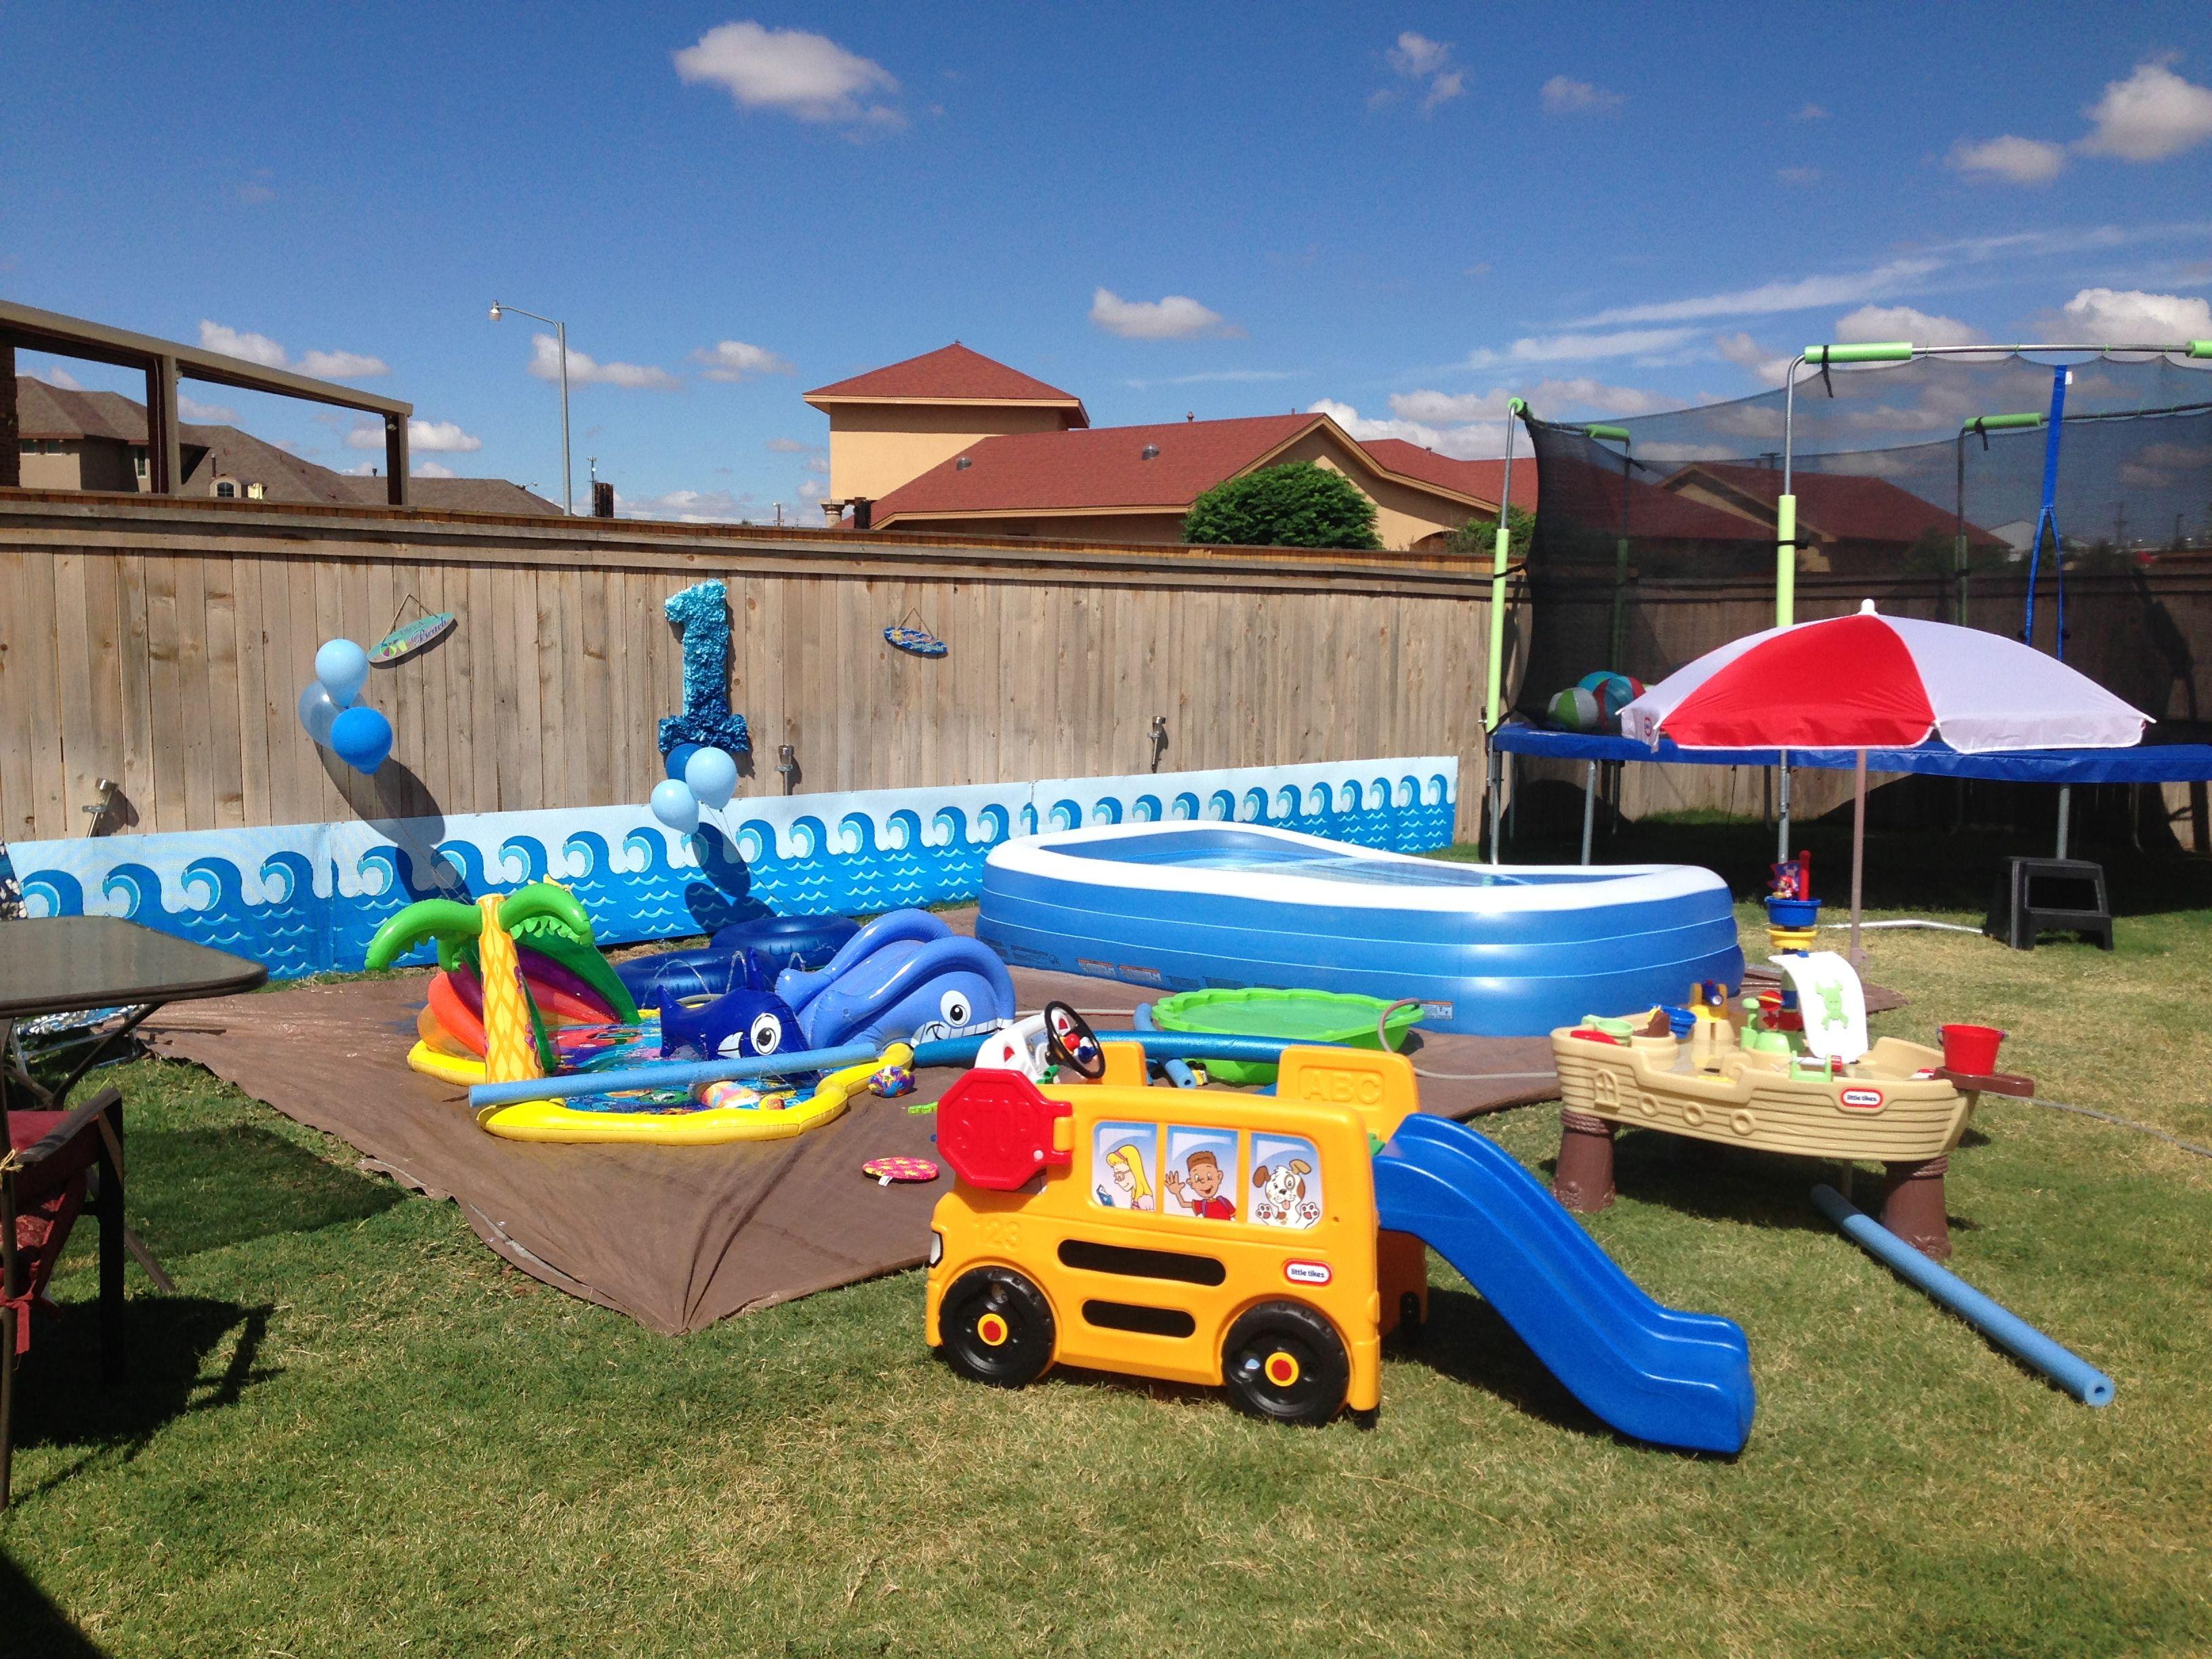 Water party | Water birthday parties, Backyard birthday ...